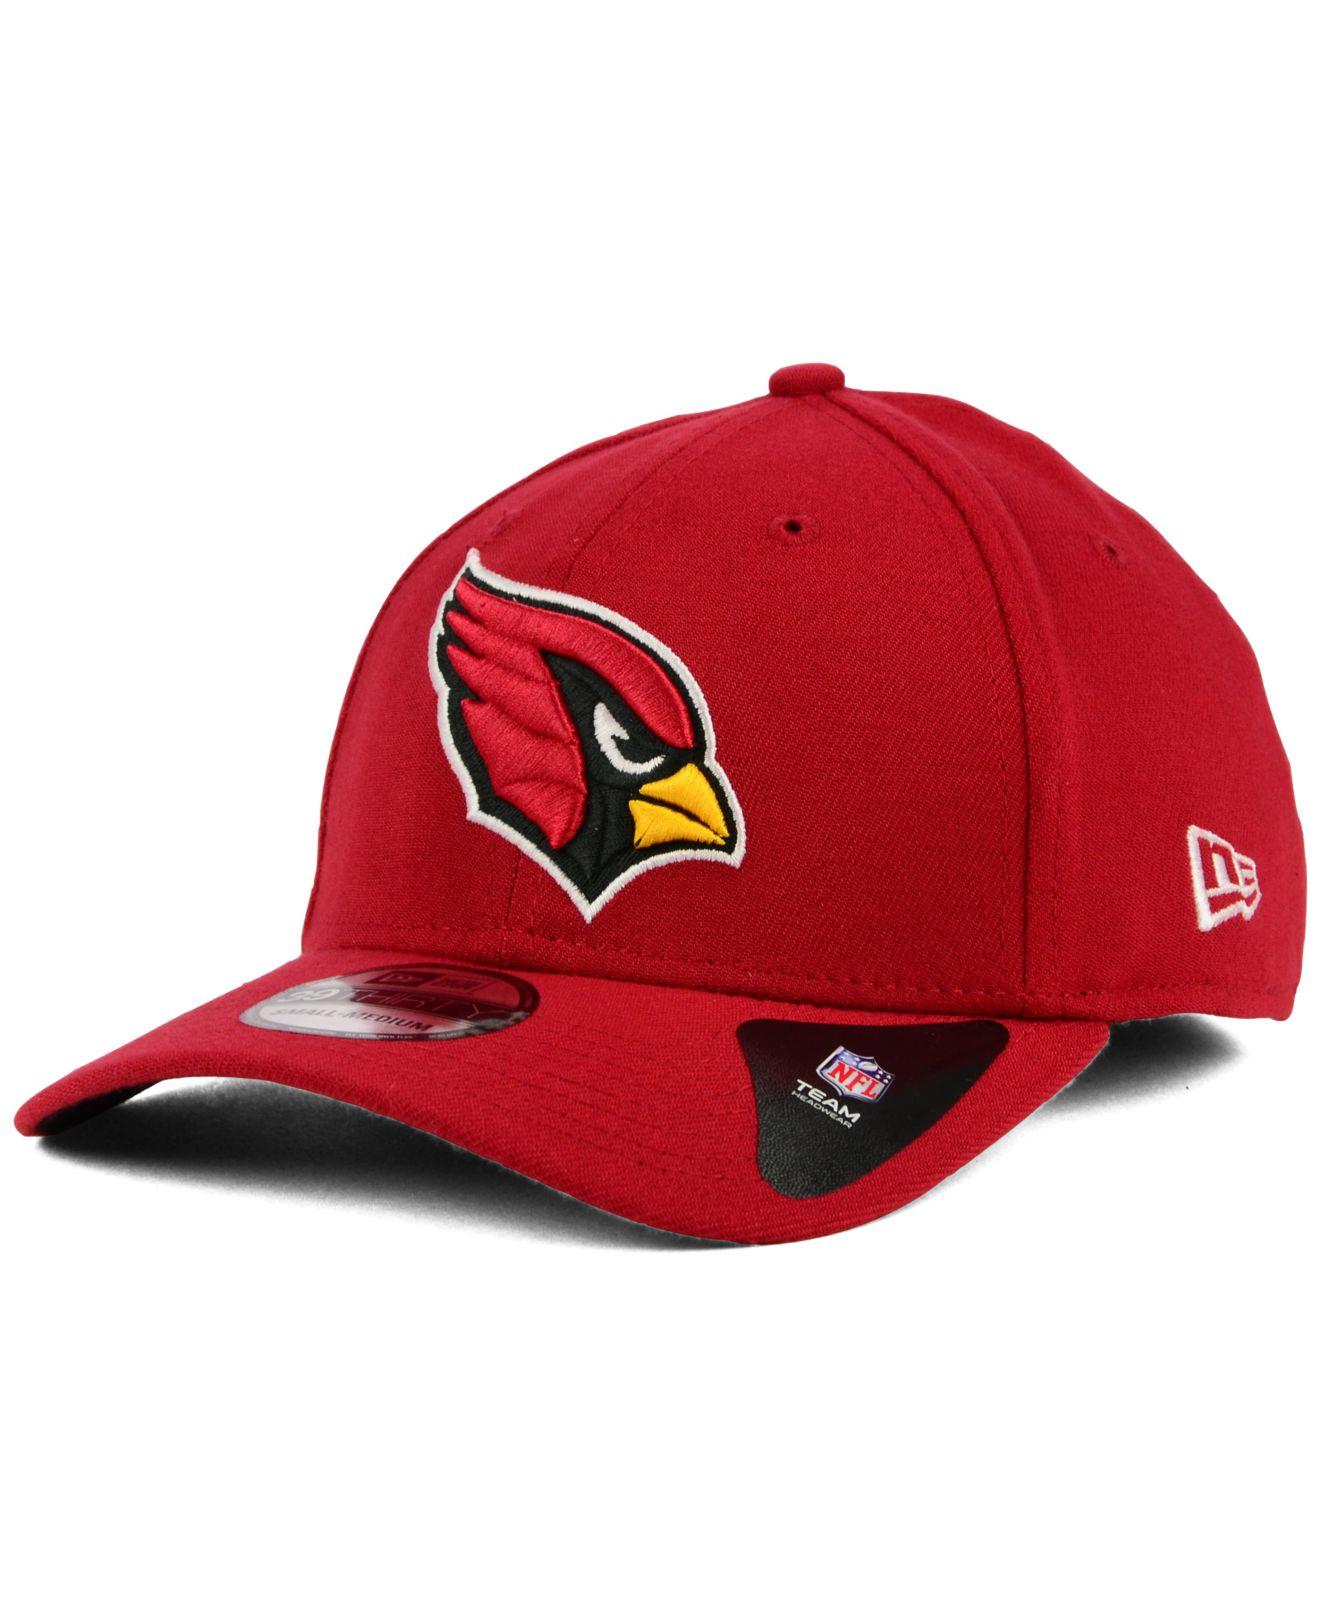 ktz arizona cardinals classic 39thirty cap in red for men. Black Bedroom Furniture Sets. Home Design Ideas